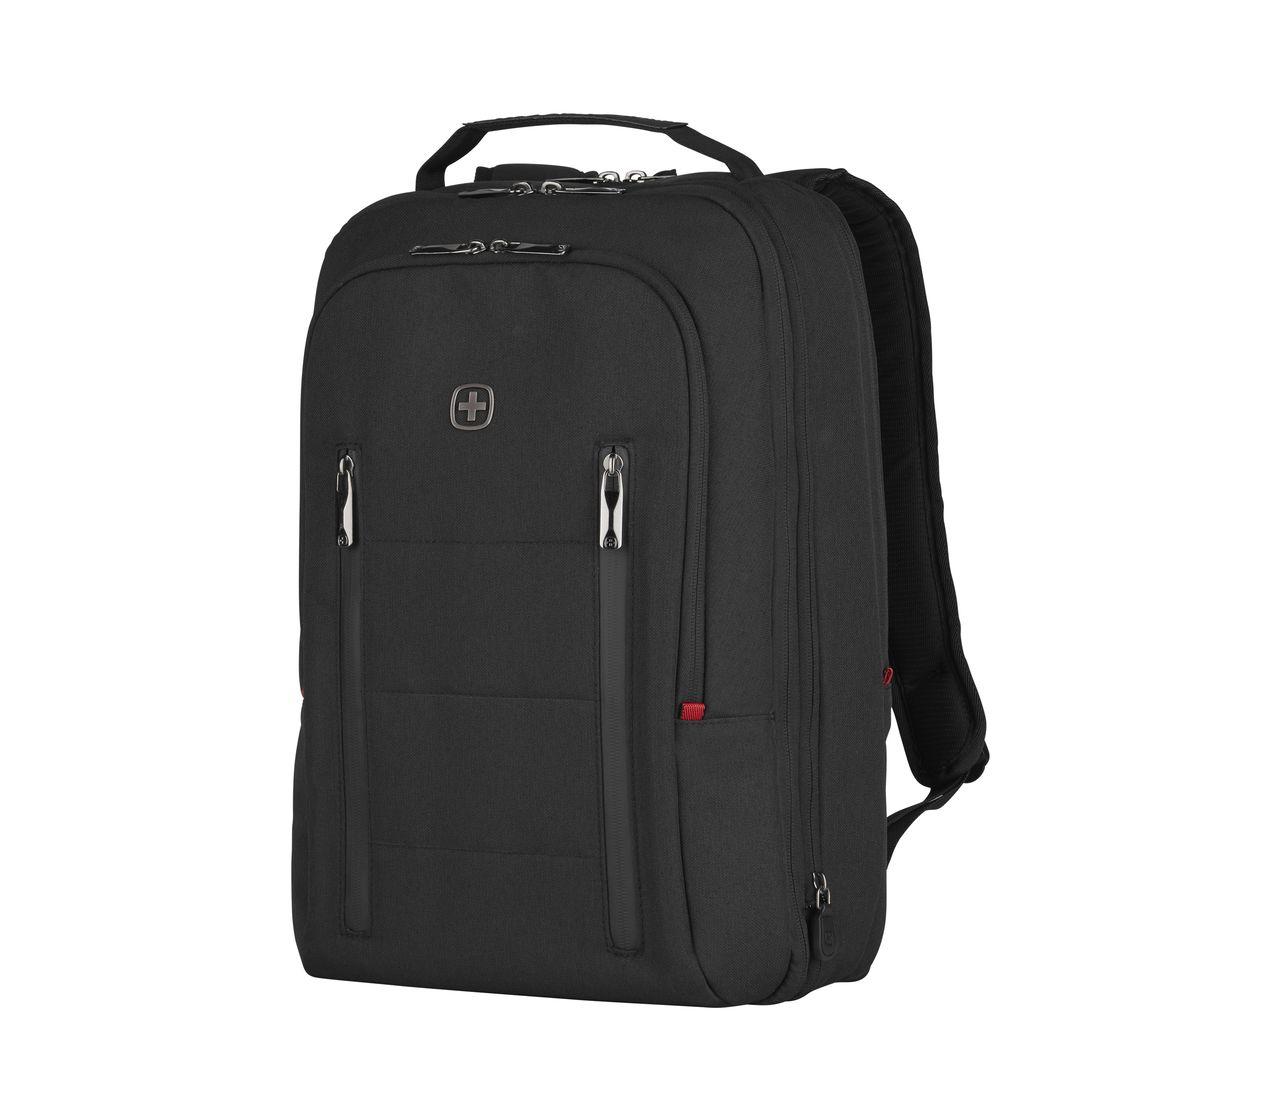 Wenger City Traveler Carry On 16 Backpack In Black 606490